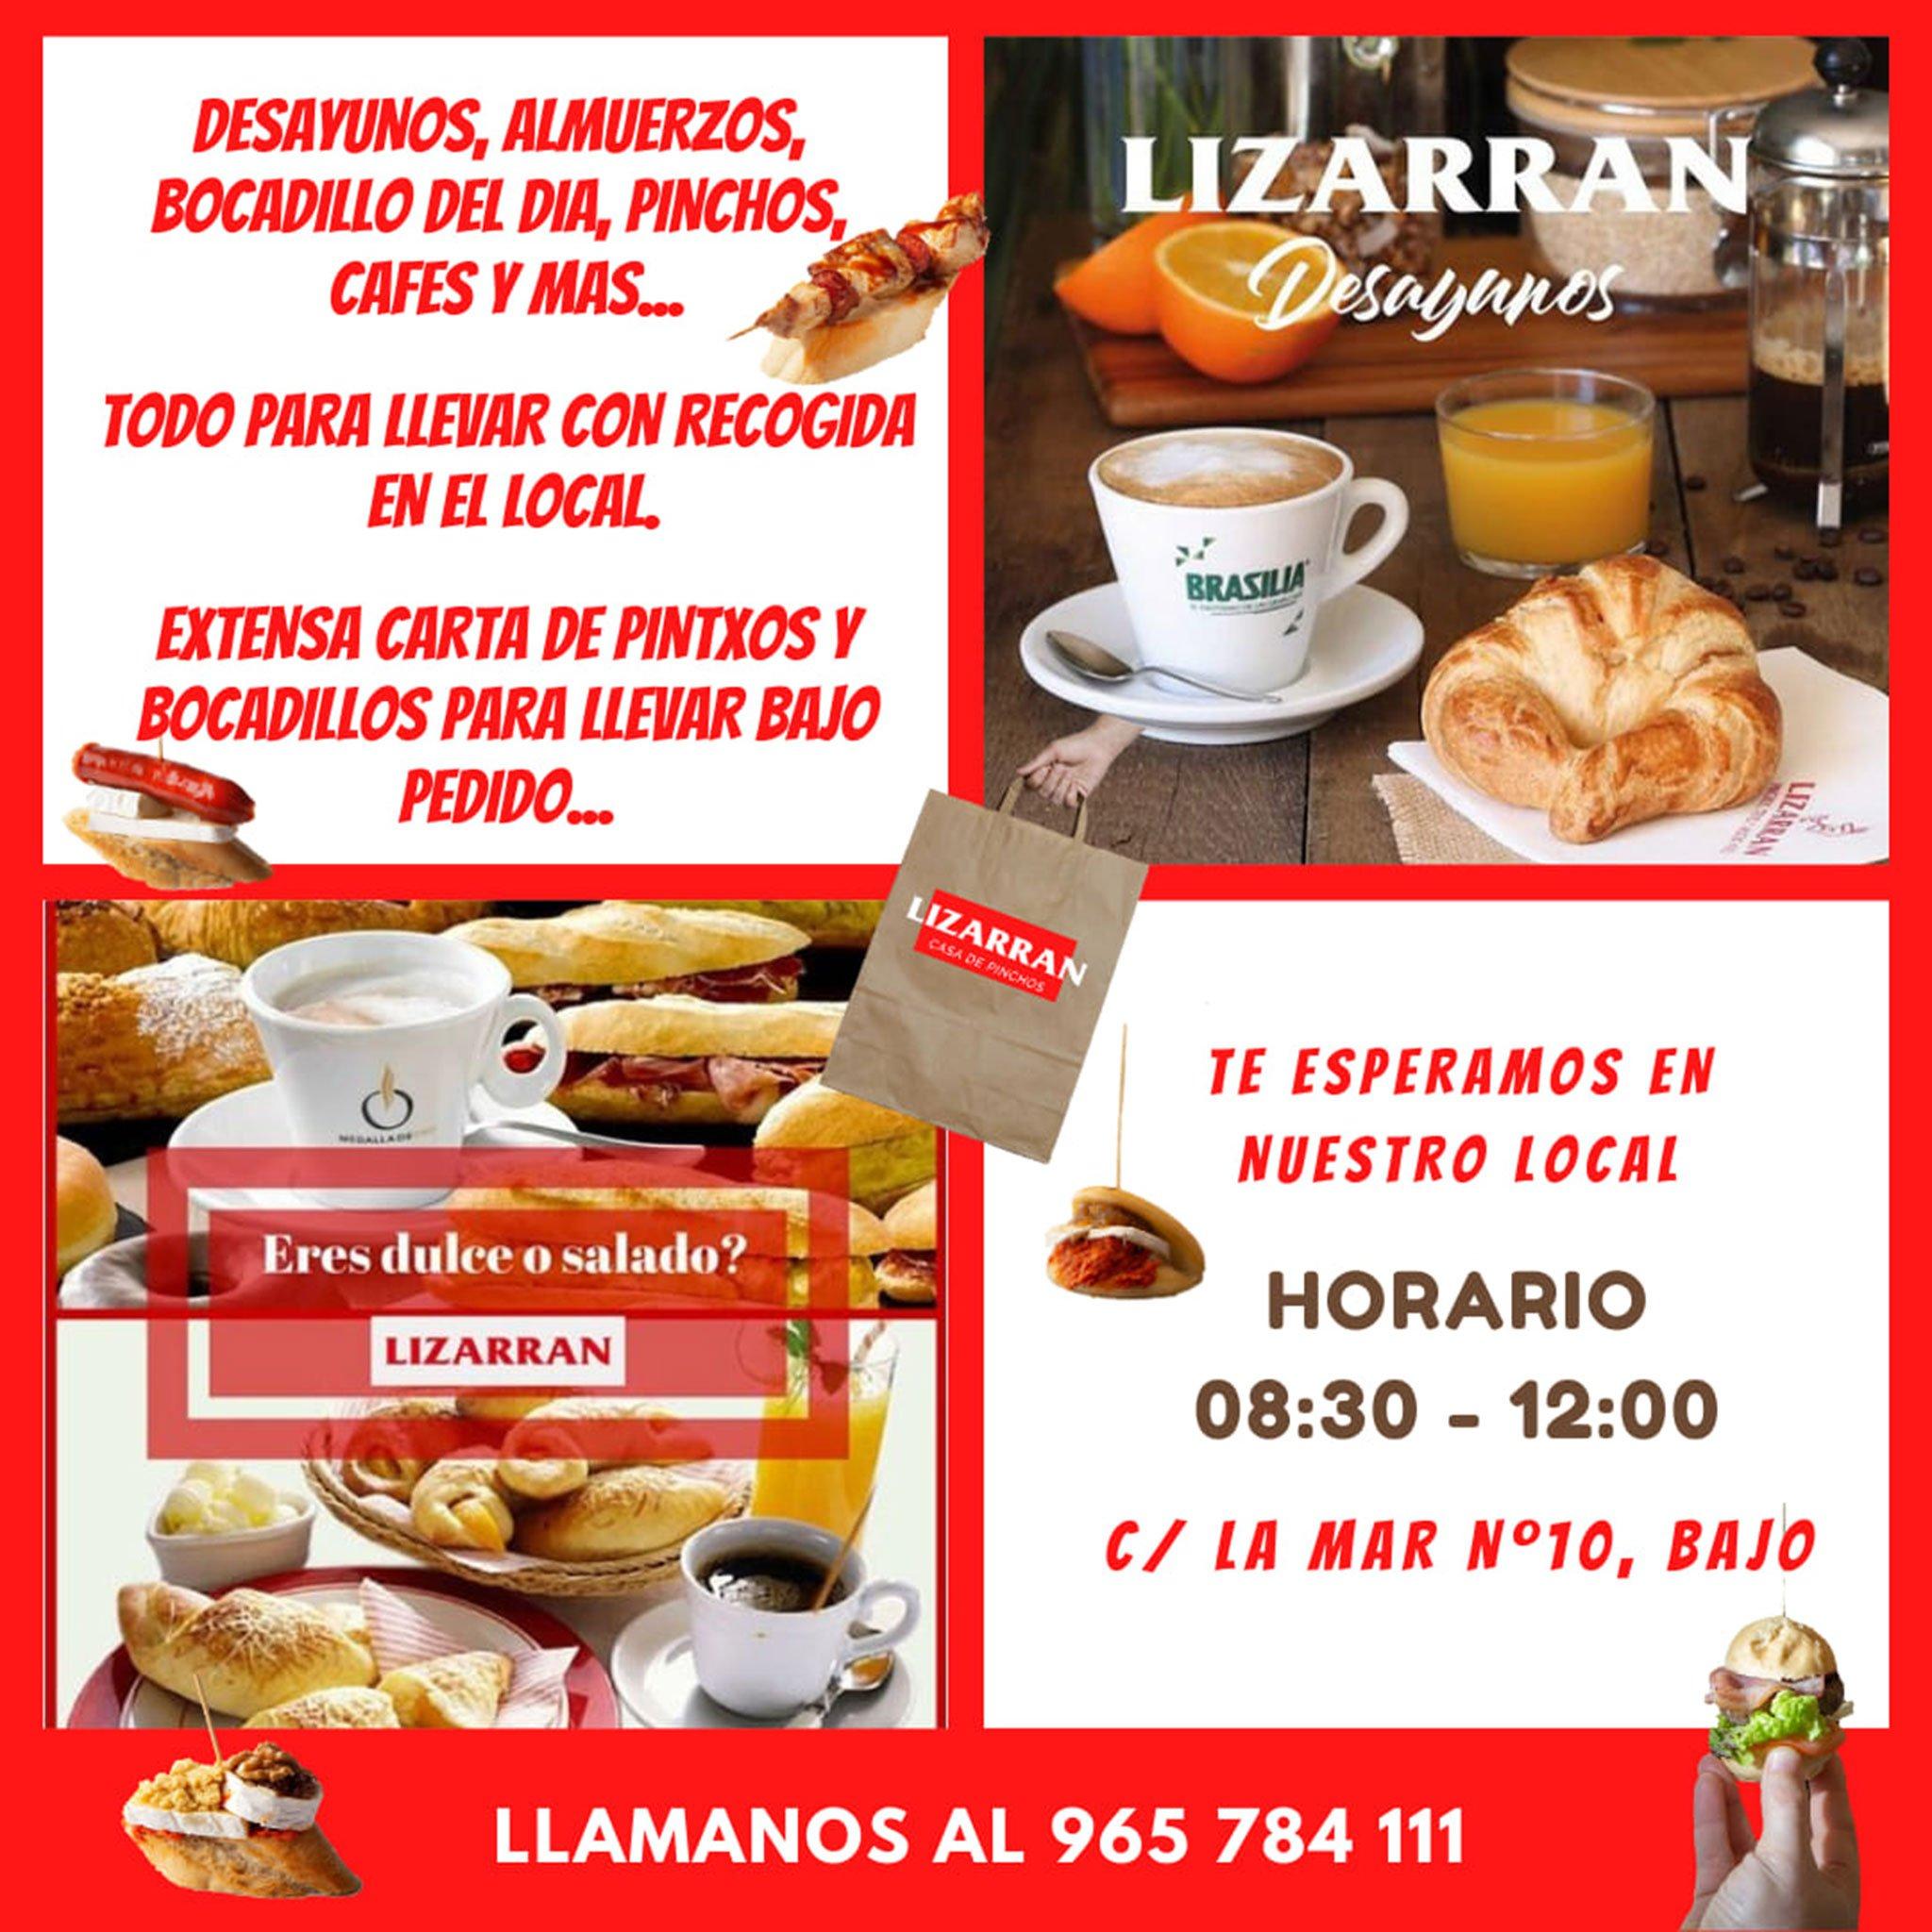 Take away food in Dénia - Lizarrán